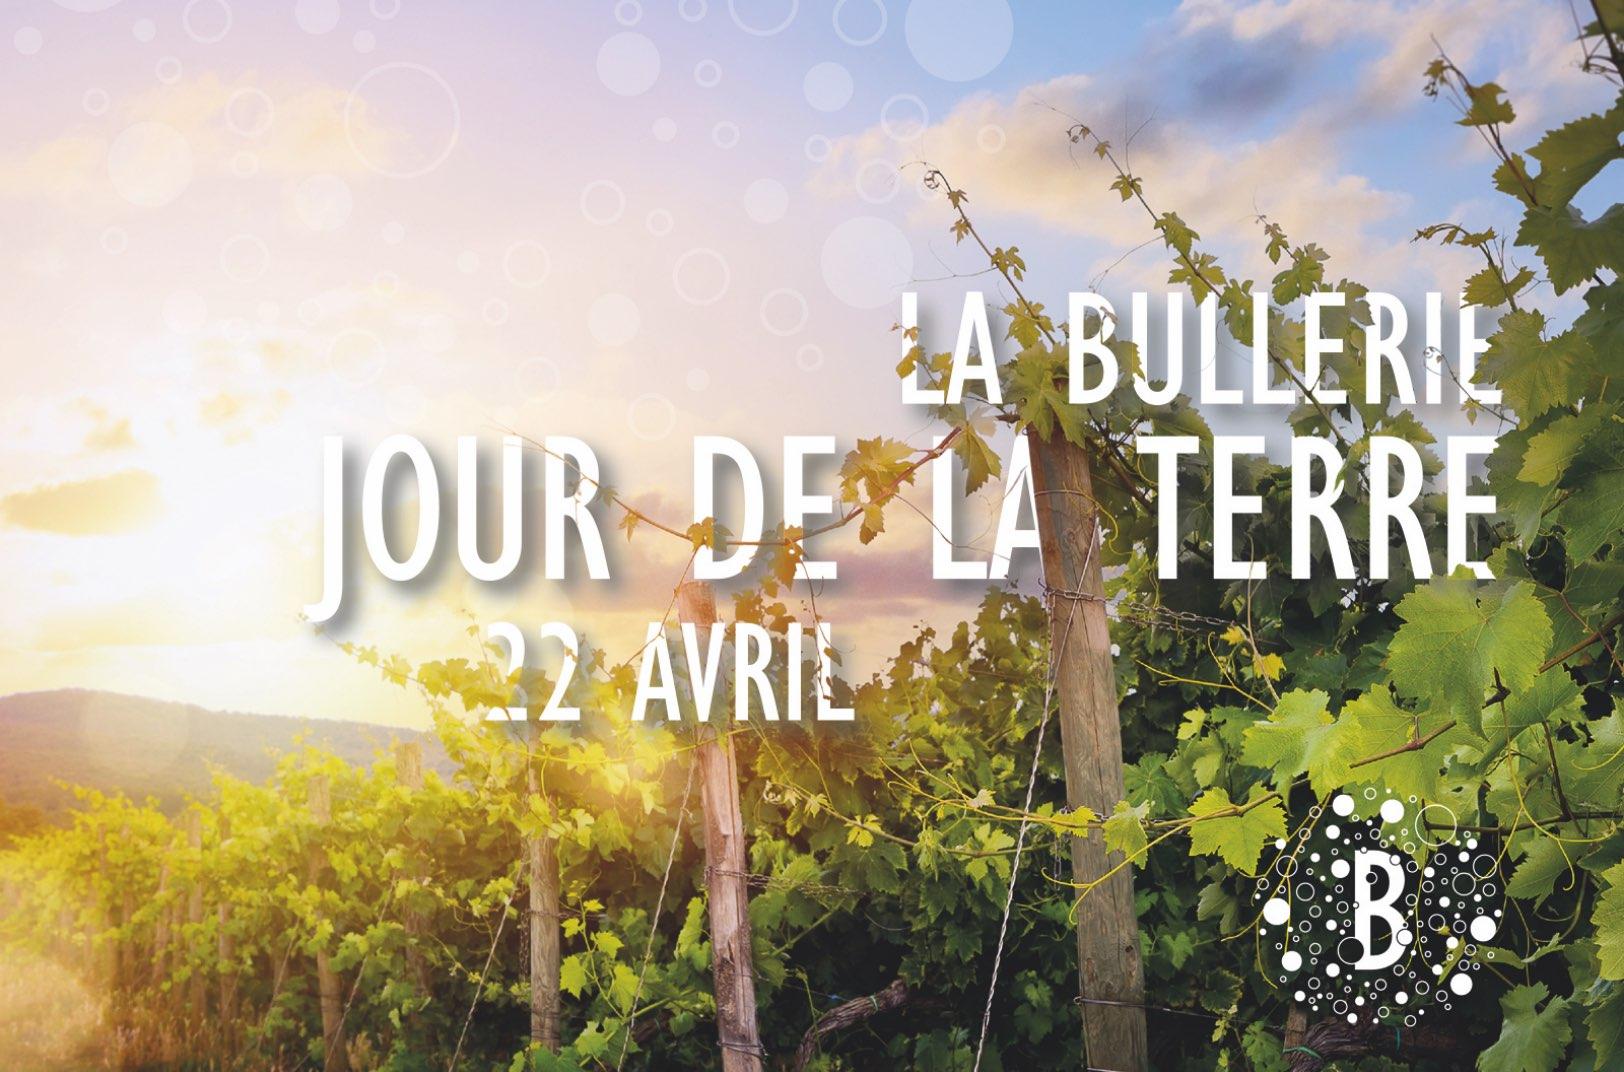 La Bullerie - Idylliq